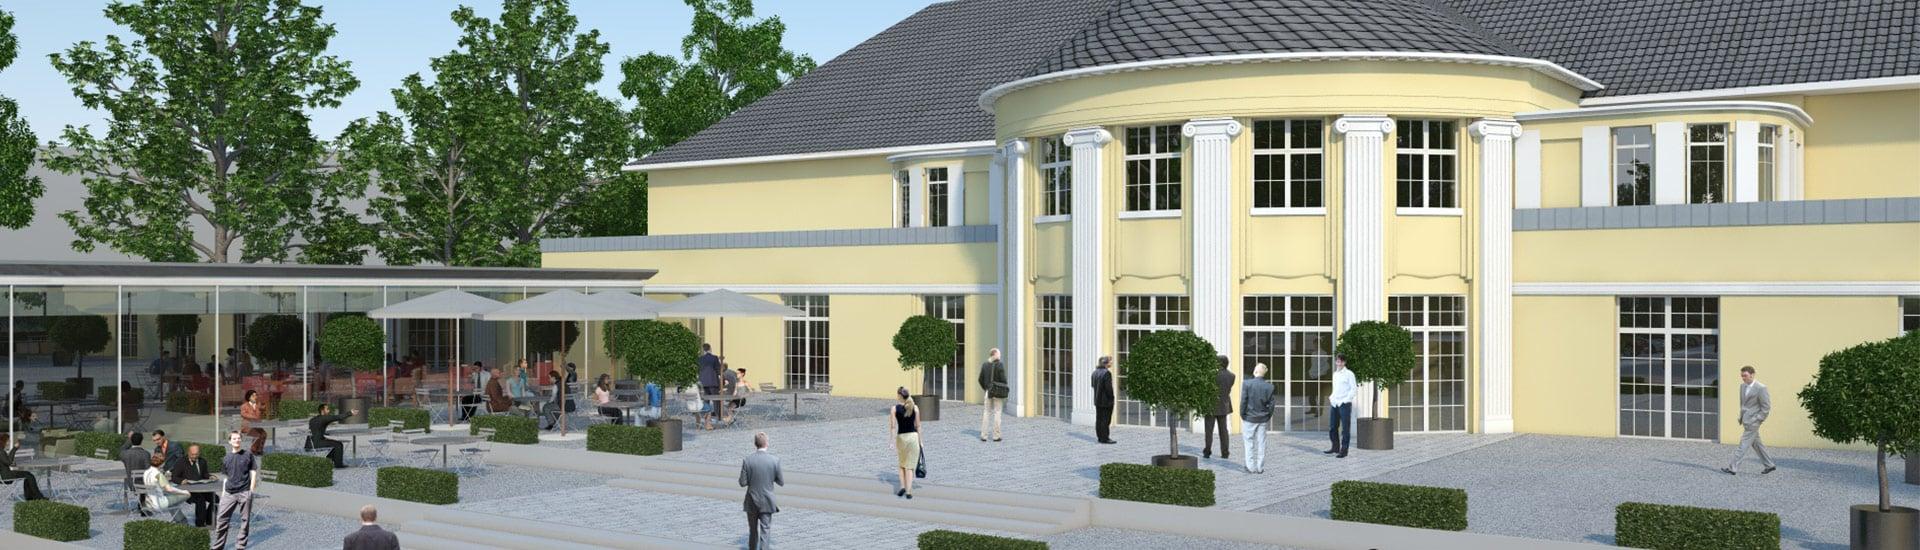 Stadthalle Bocholt Brauhaus